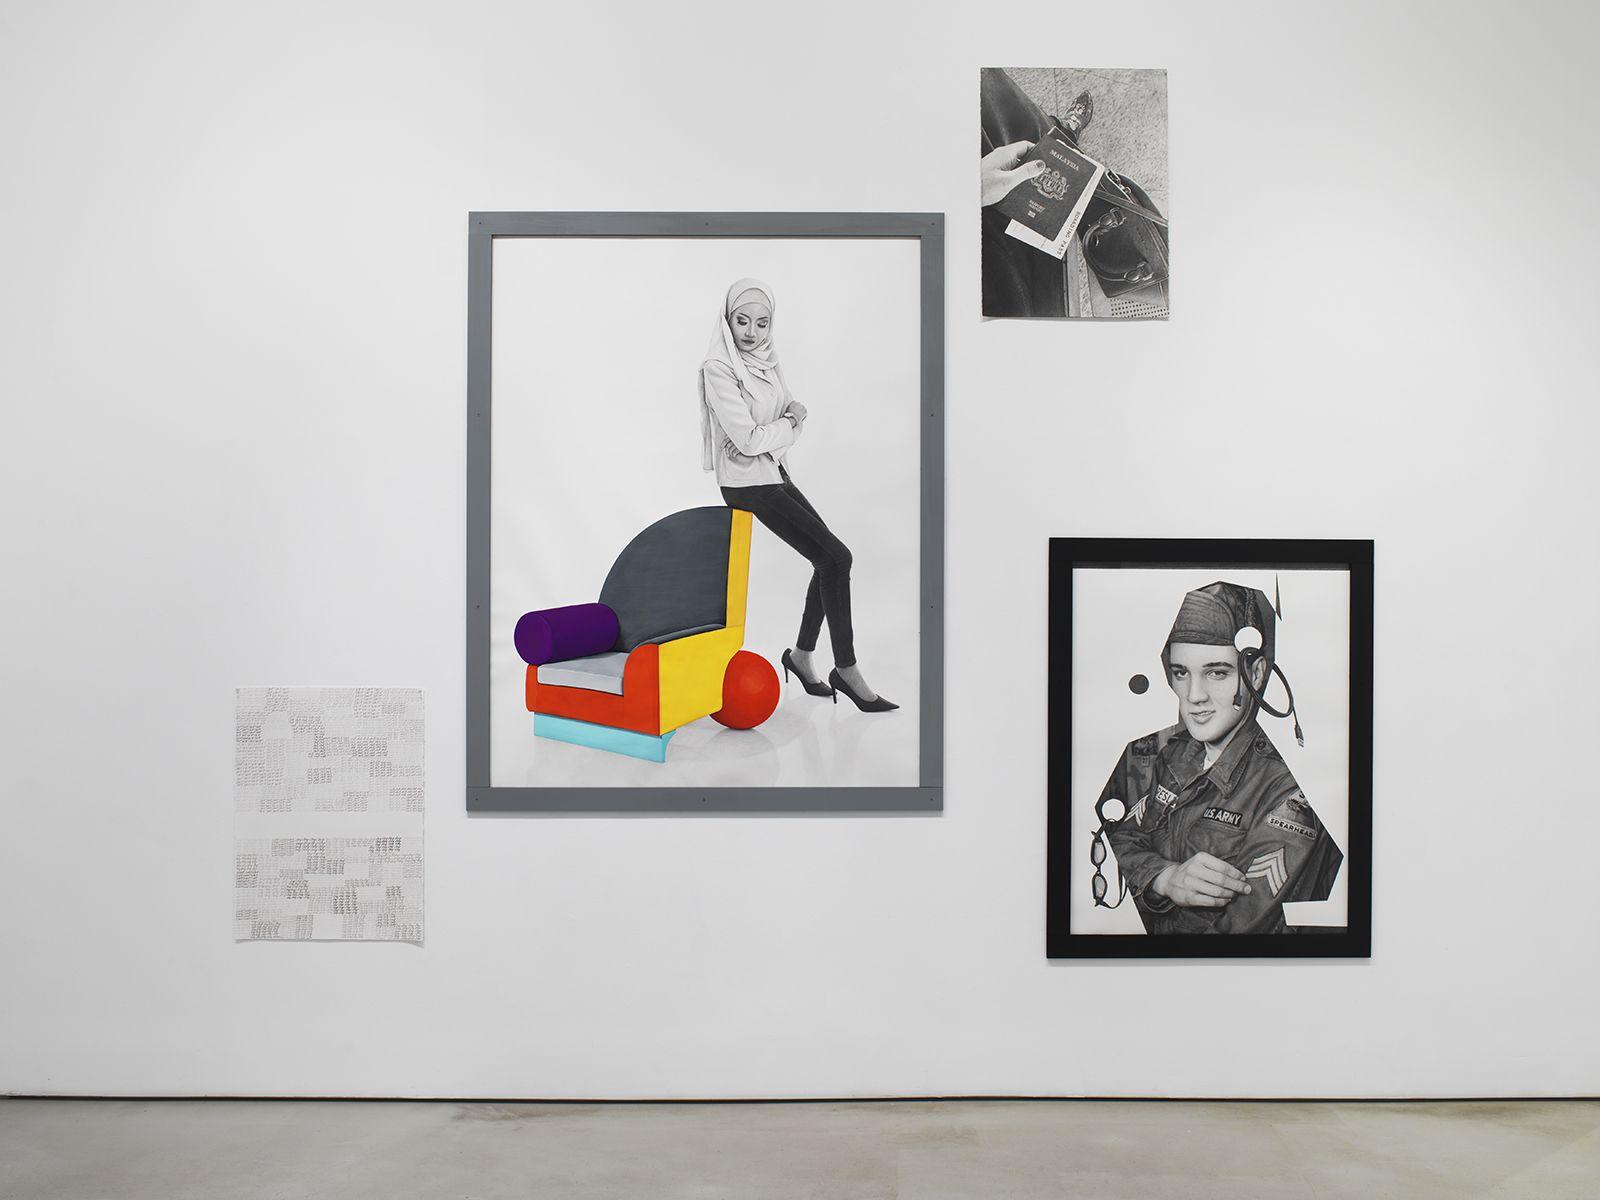 KARL HAENDEL Installation view of Masses & Mainstream at Mitchell-Innes & Nash, New York, 2019